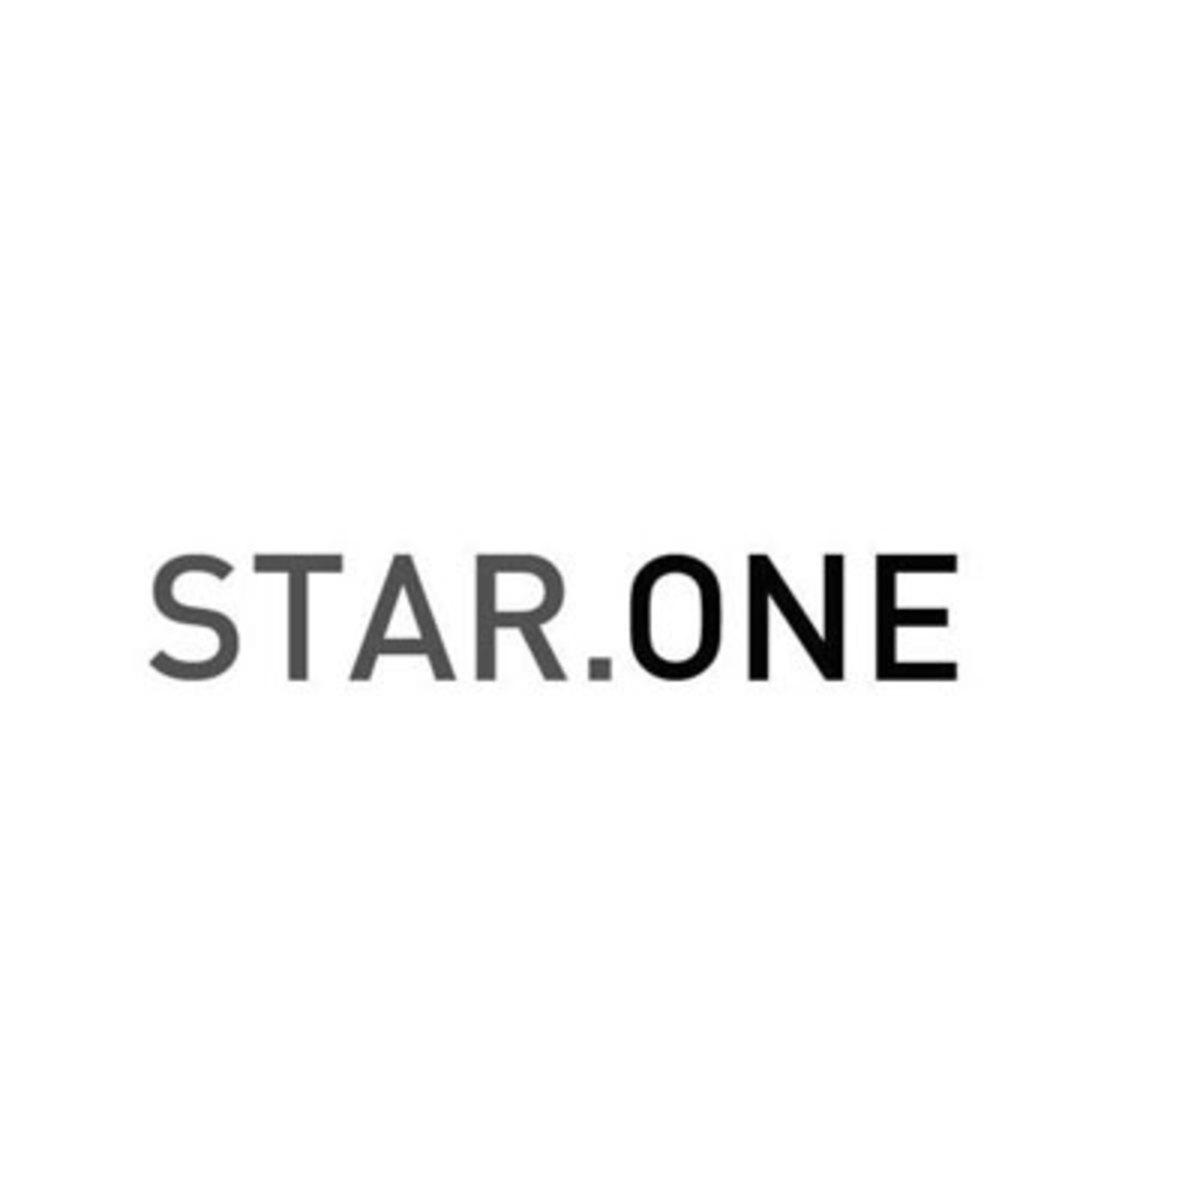 starone.jpg